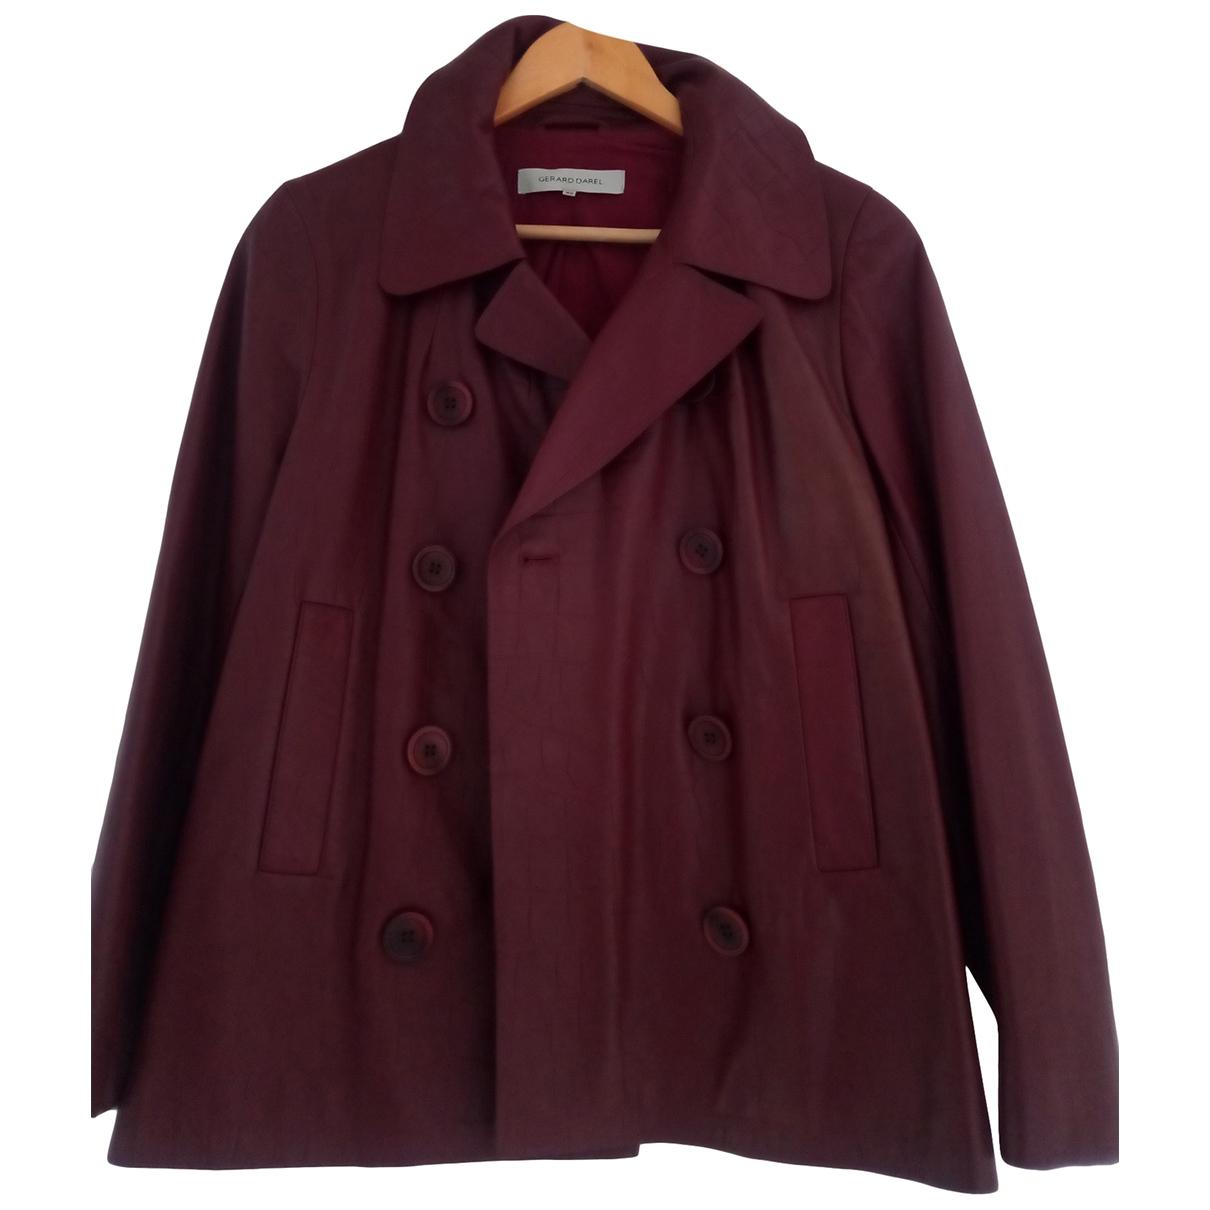 Gerard Darel \N Burgundy Leather jacket for Women 40 FR